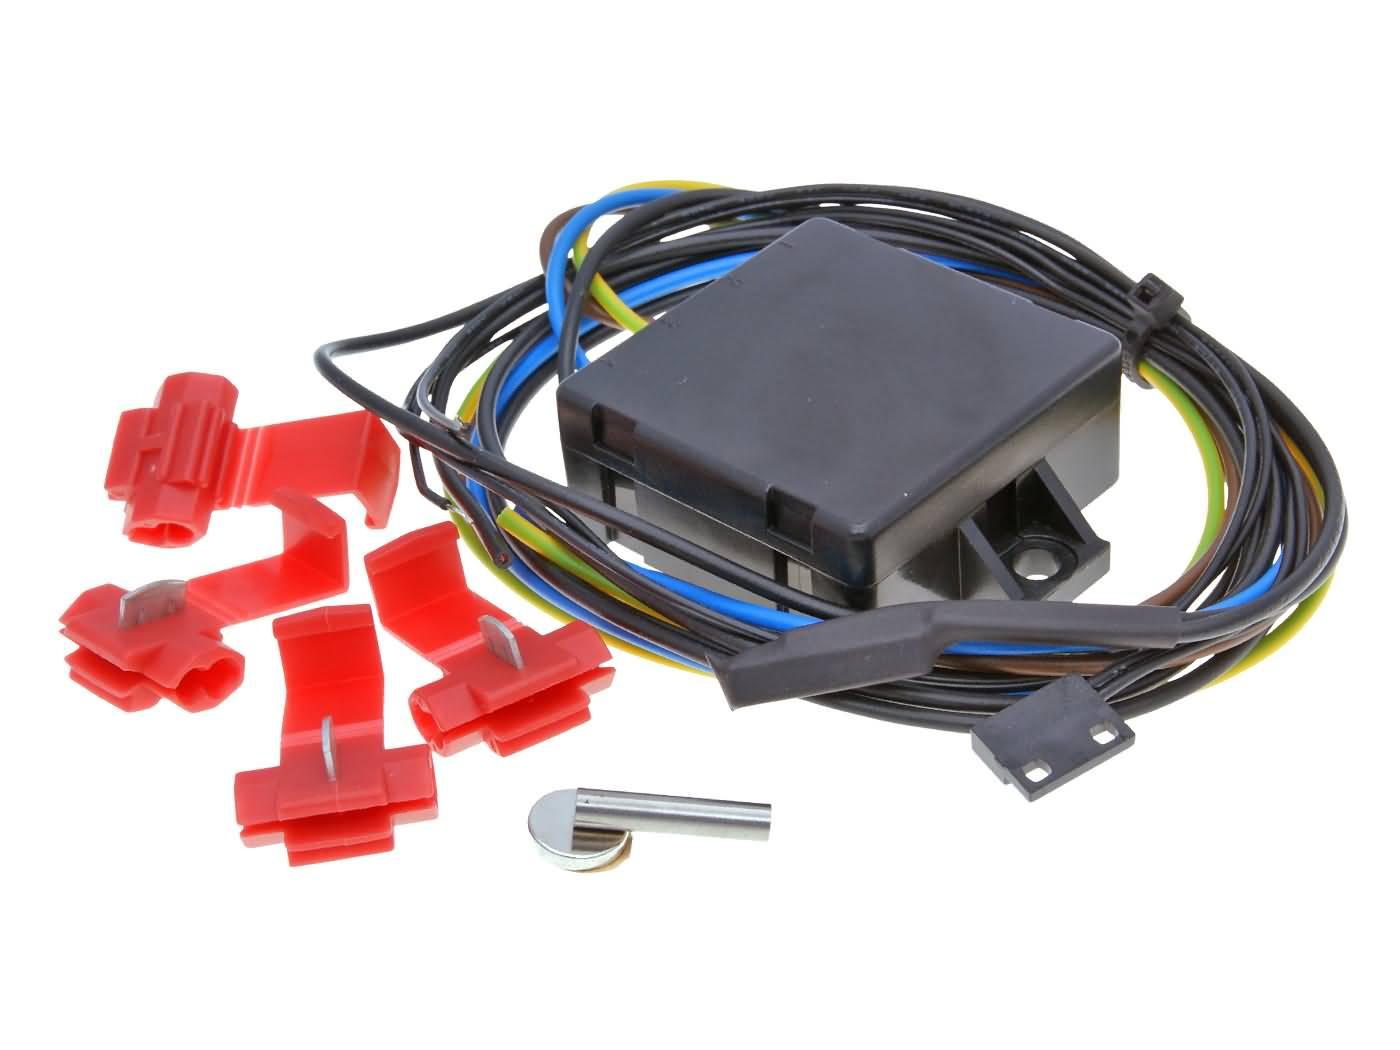 rev limiter / speed limiter magnet switch for 2-stroke